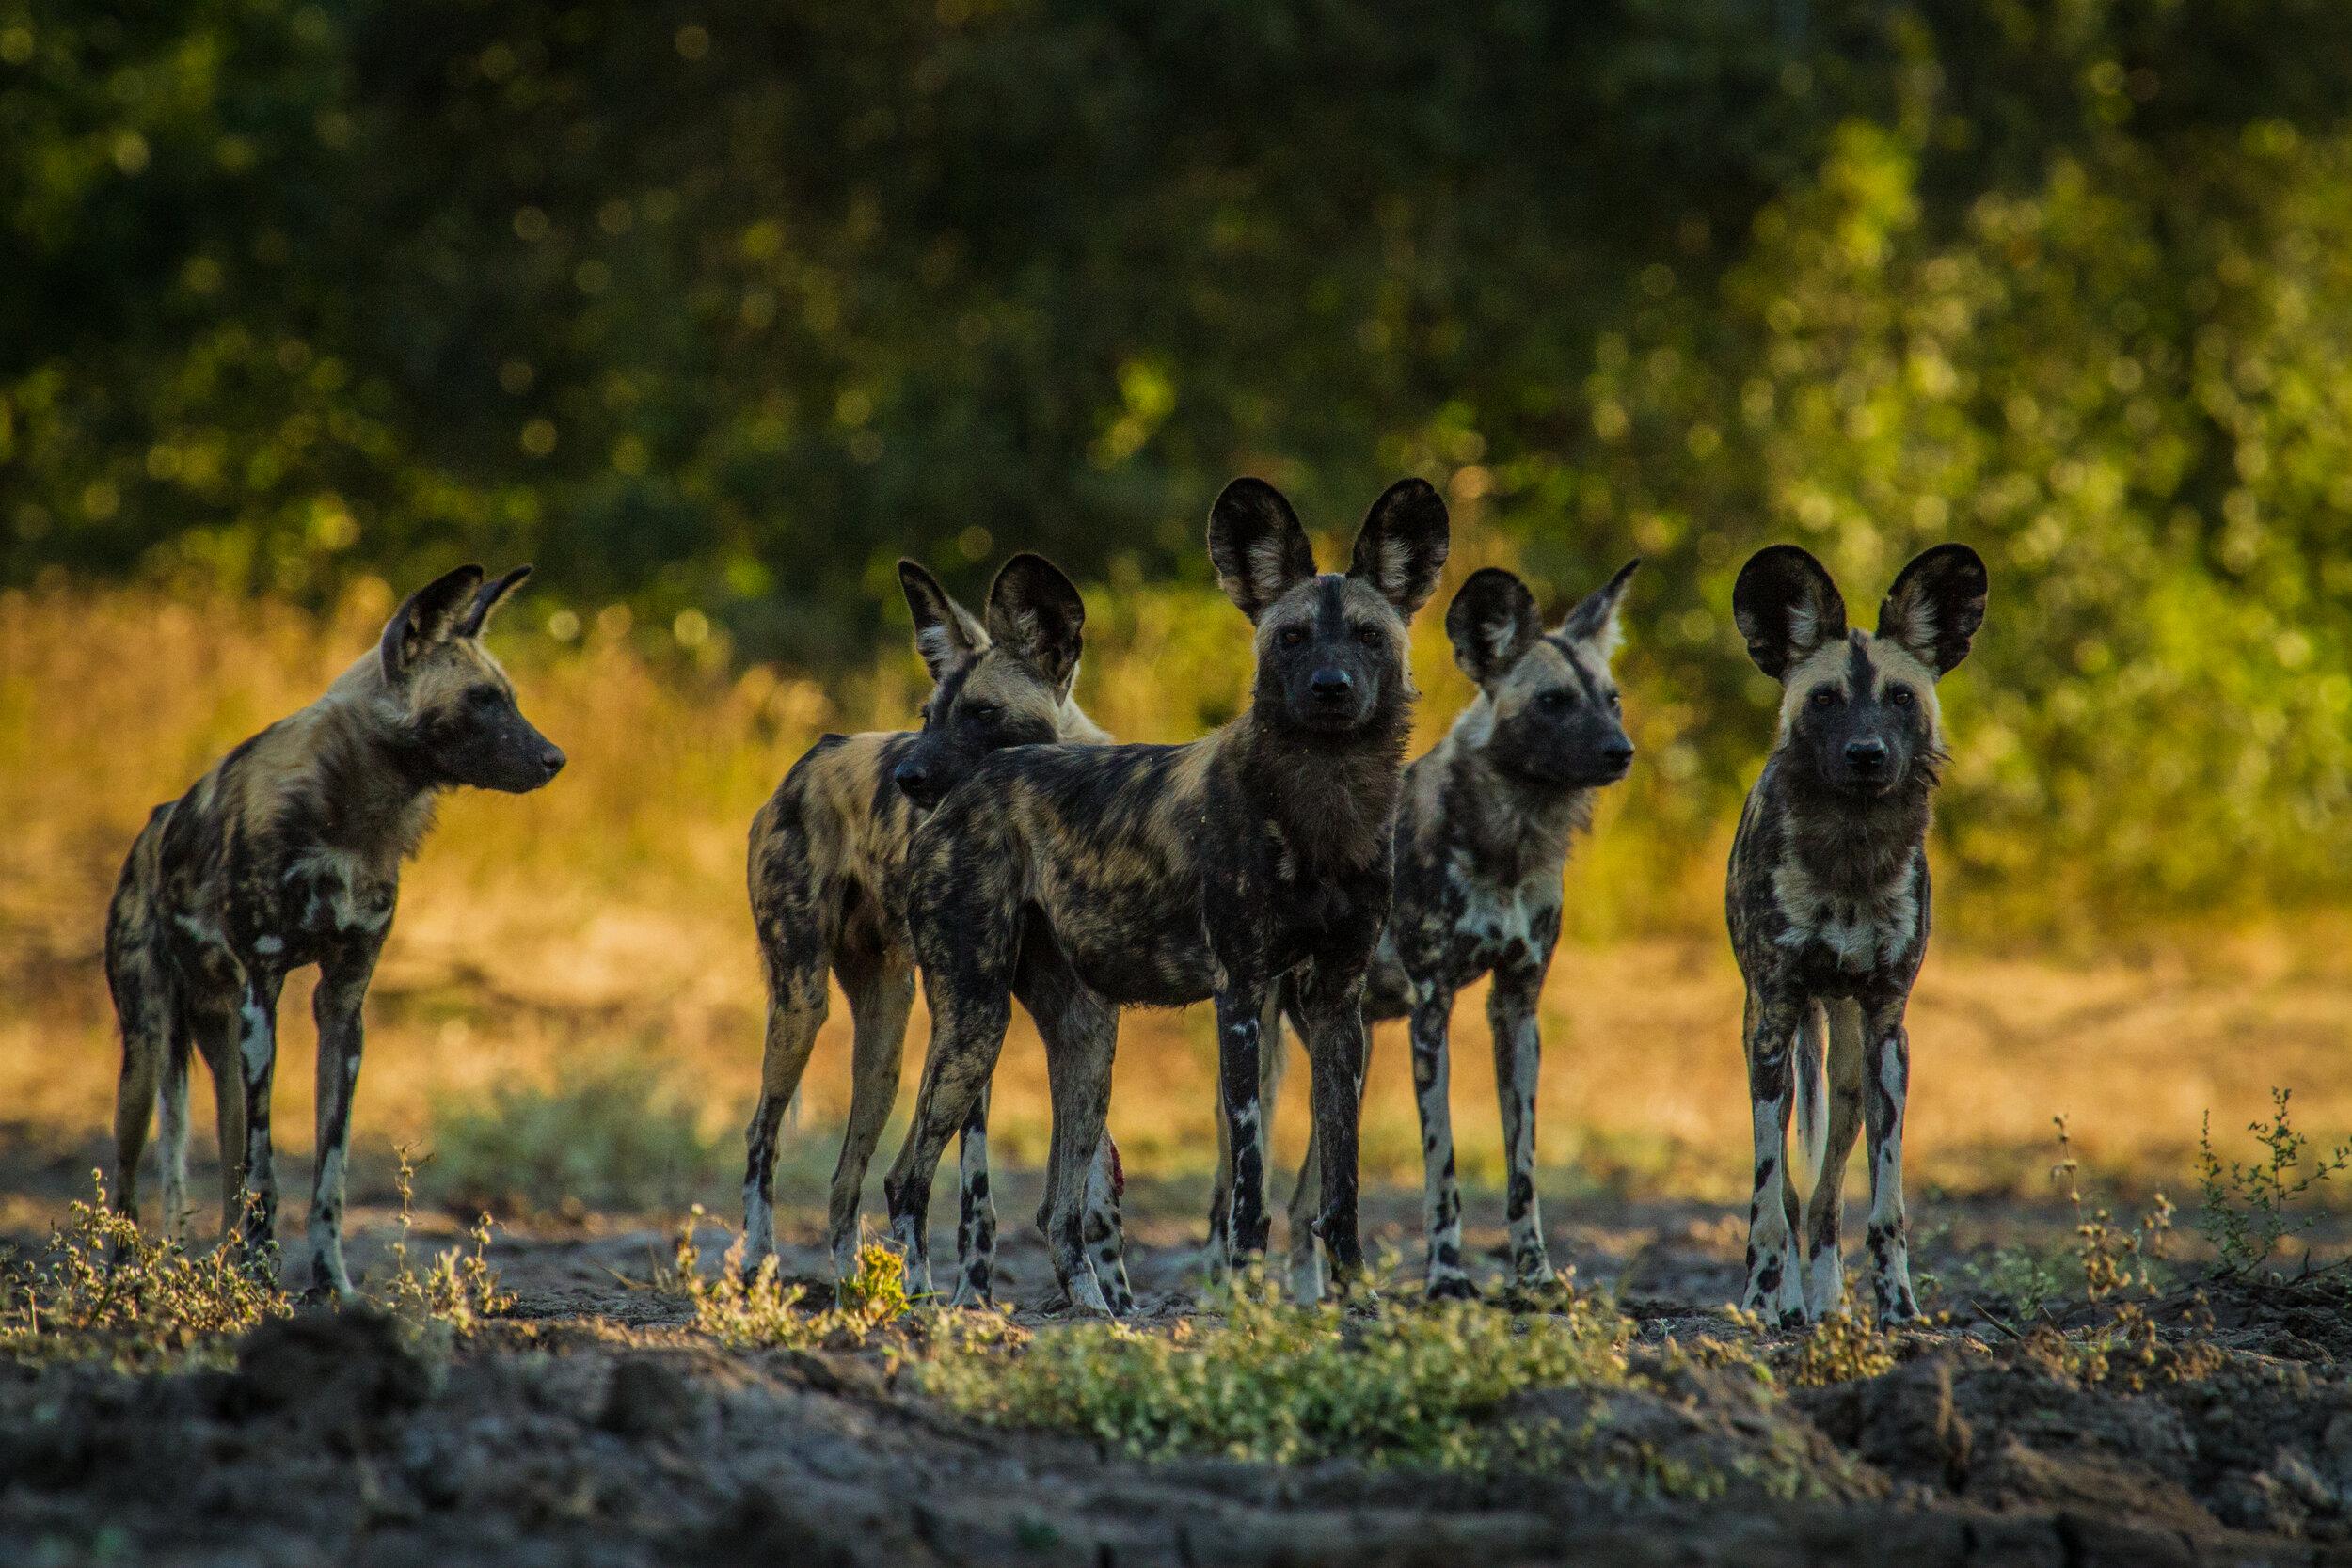 wild_dogs_mana_pools_national_park_zambezi_expeditions_african_bush_camps_zimbabwe_wildlife_safari.jpg